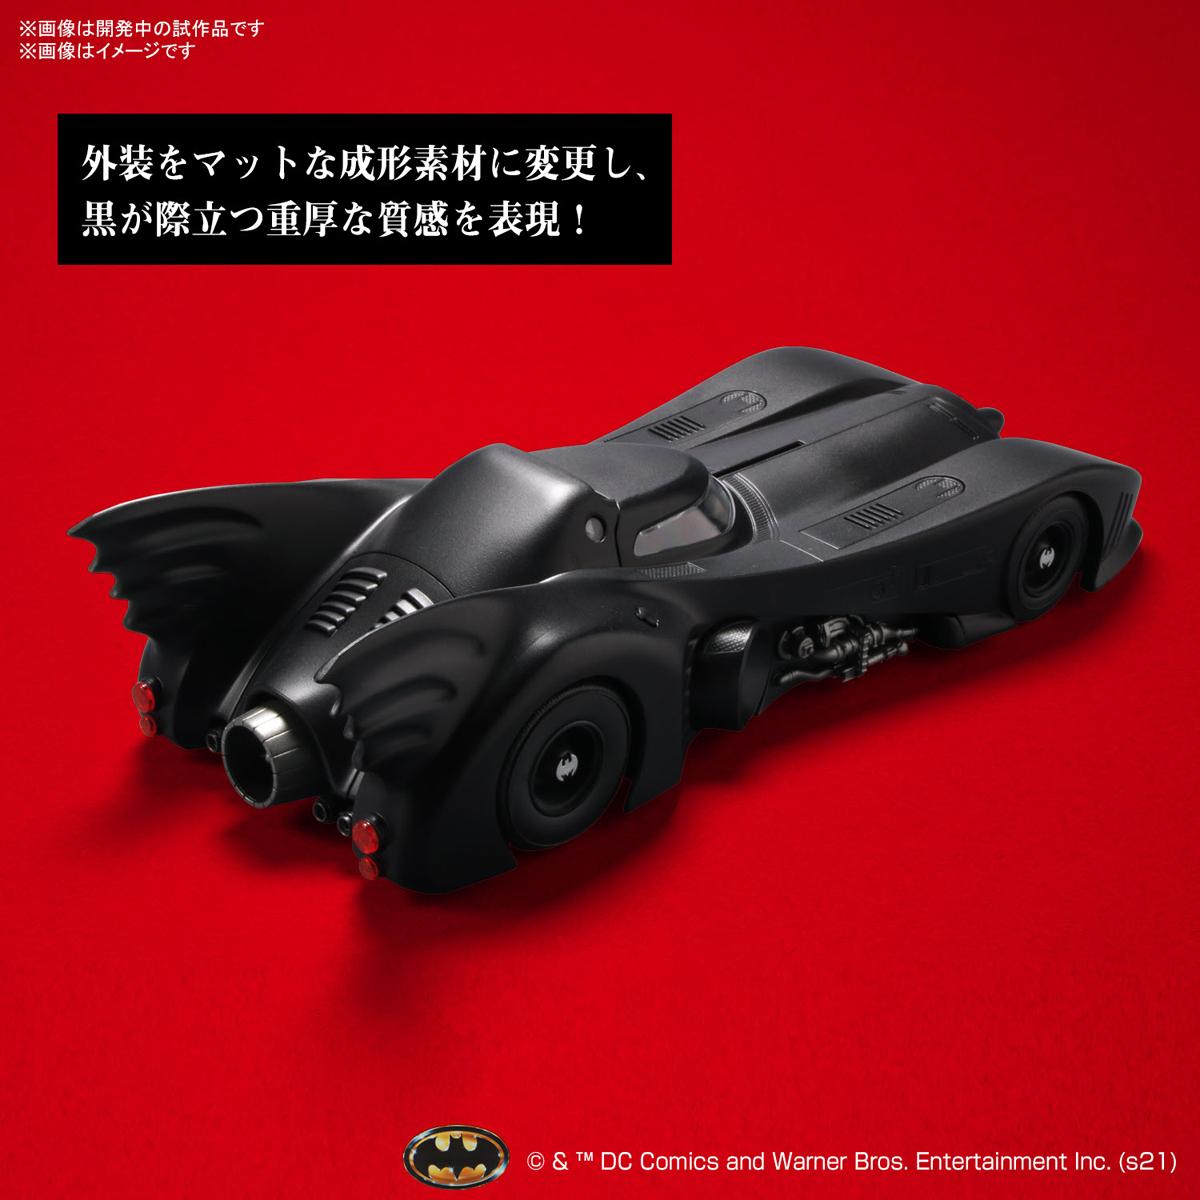 1/35 SCALE バットモービル(バットマンVer.)